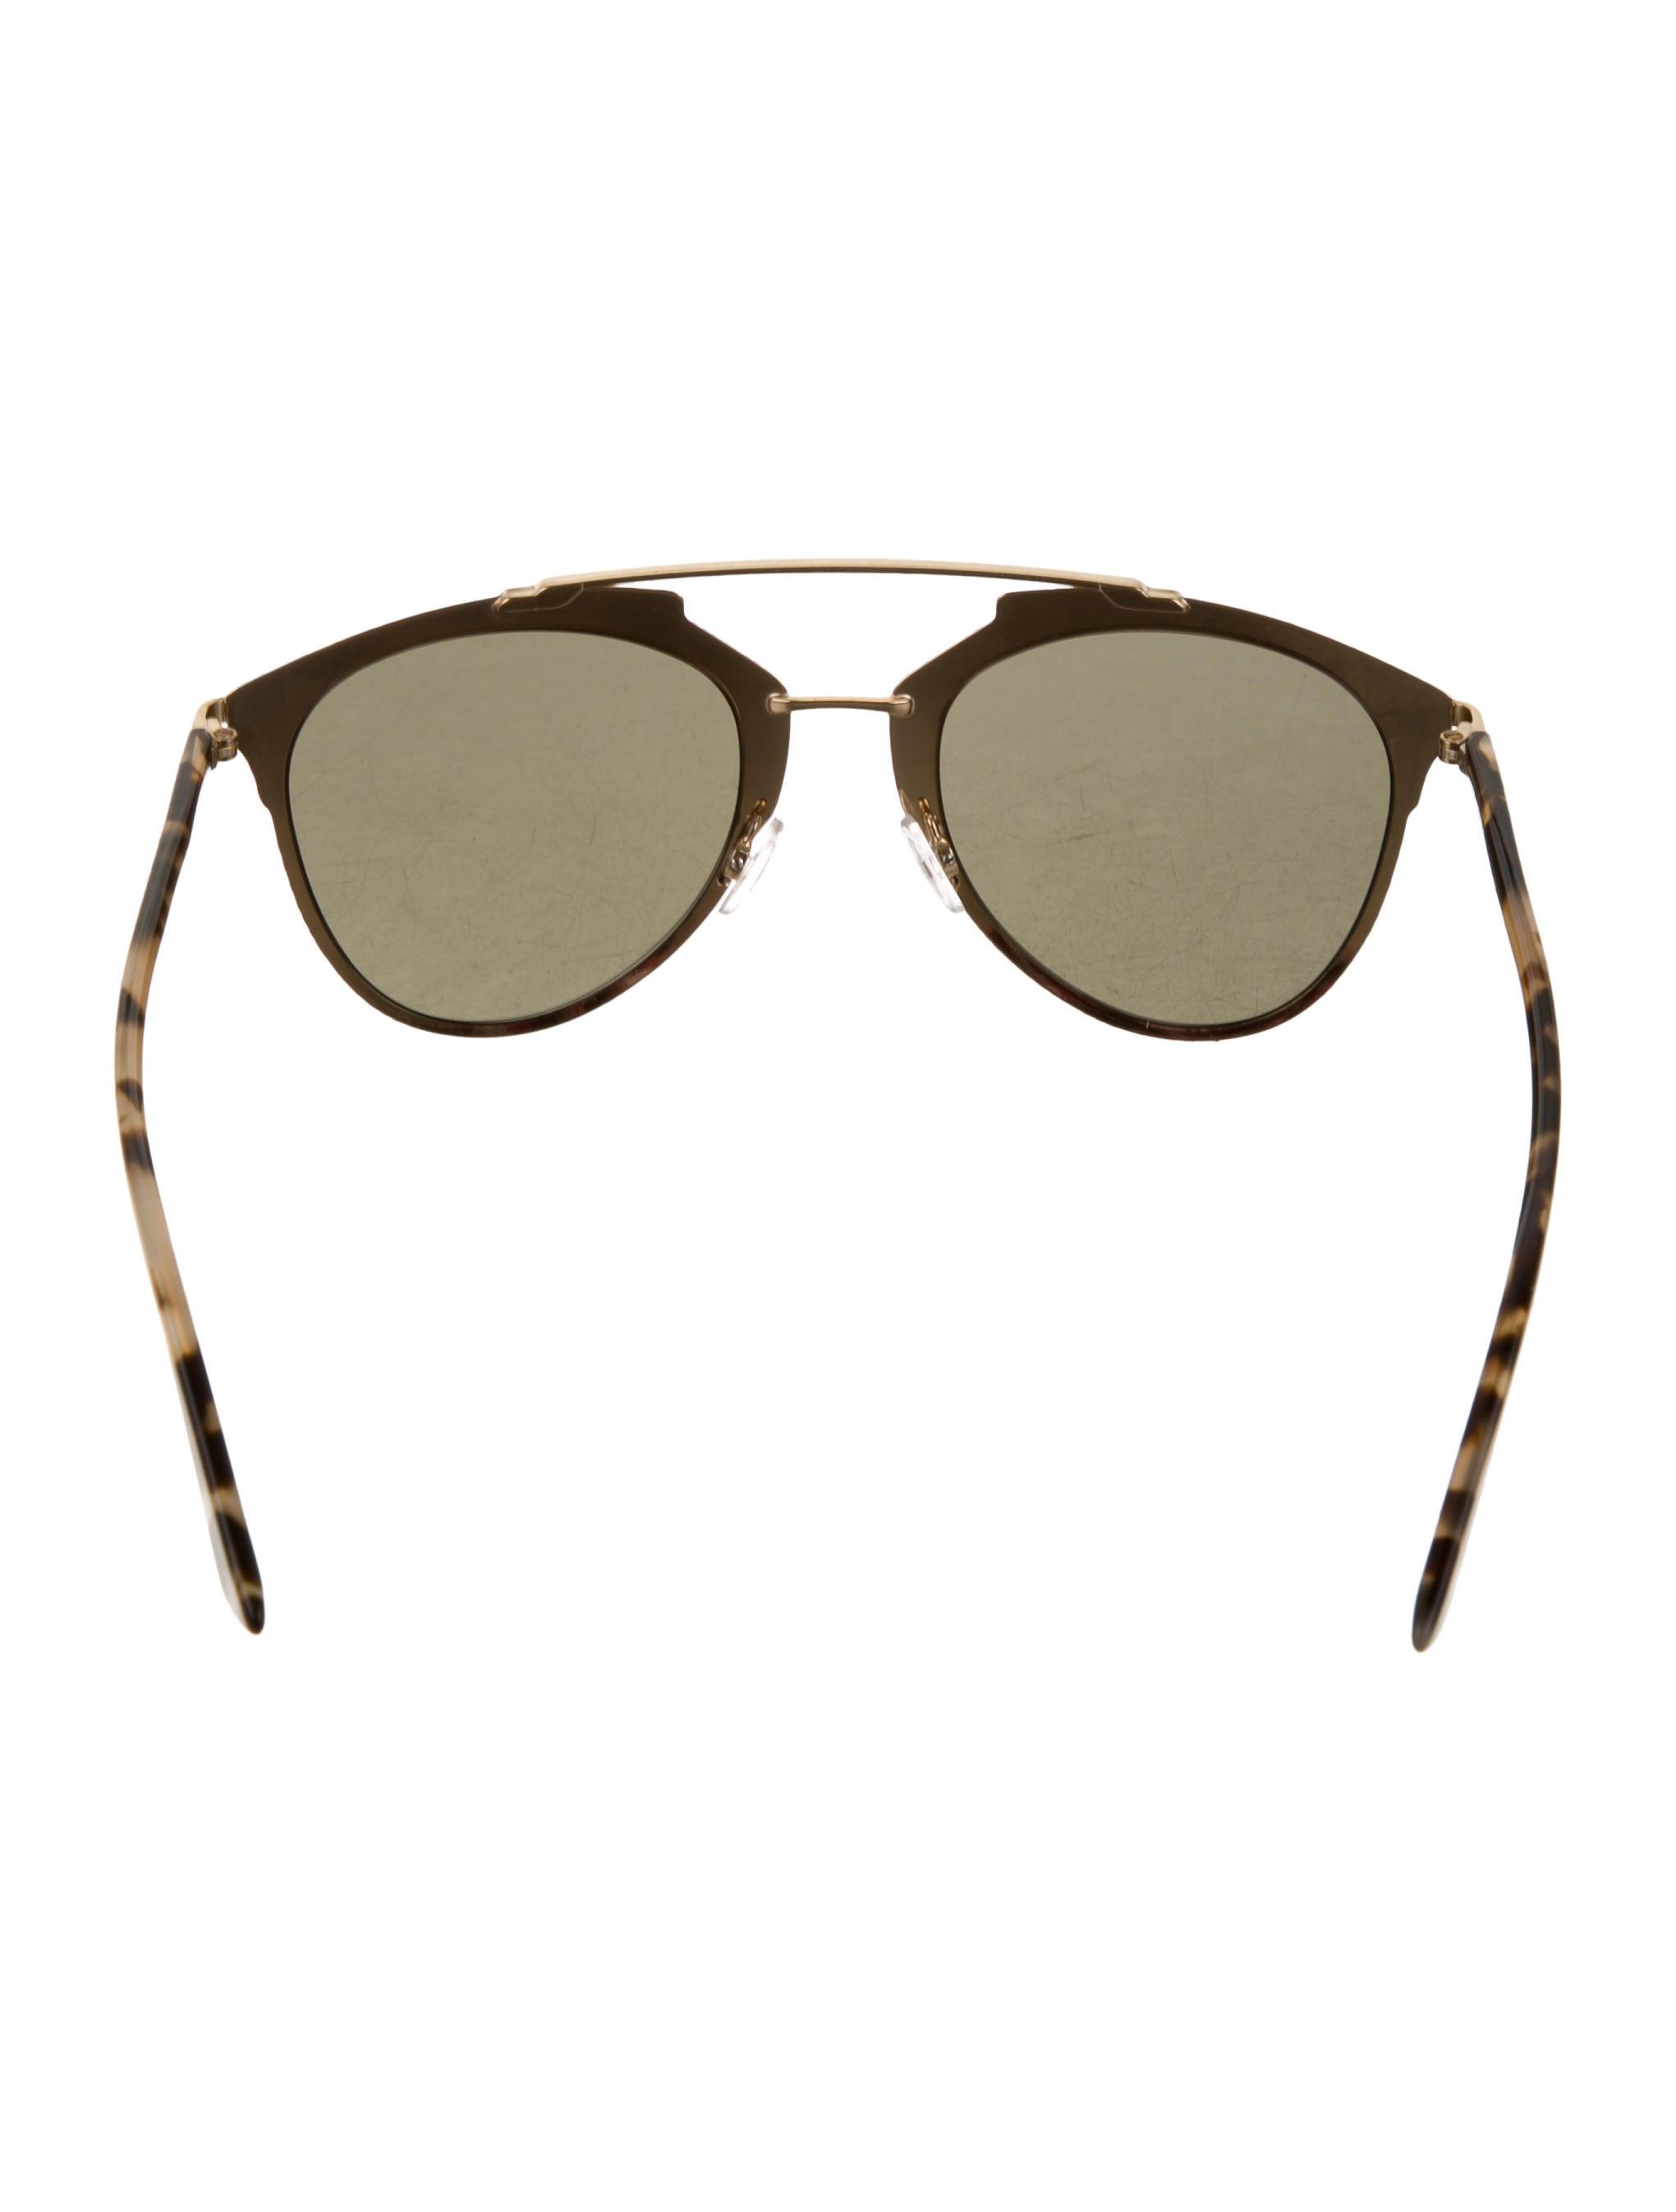 1f9cac08b286 Dior Origins Sunglasses Men